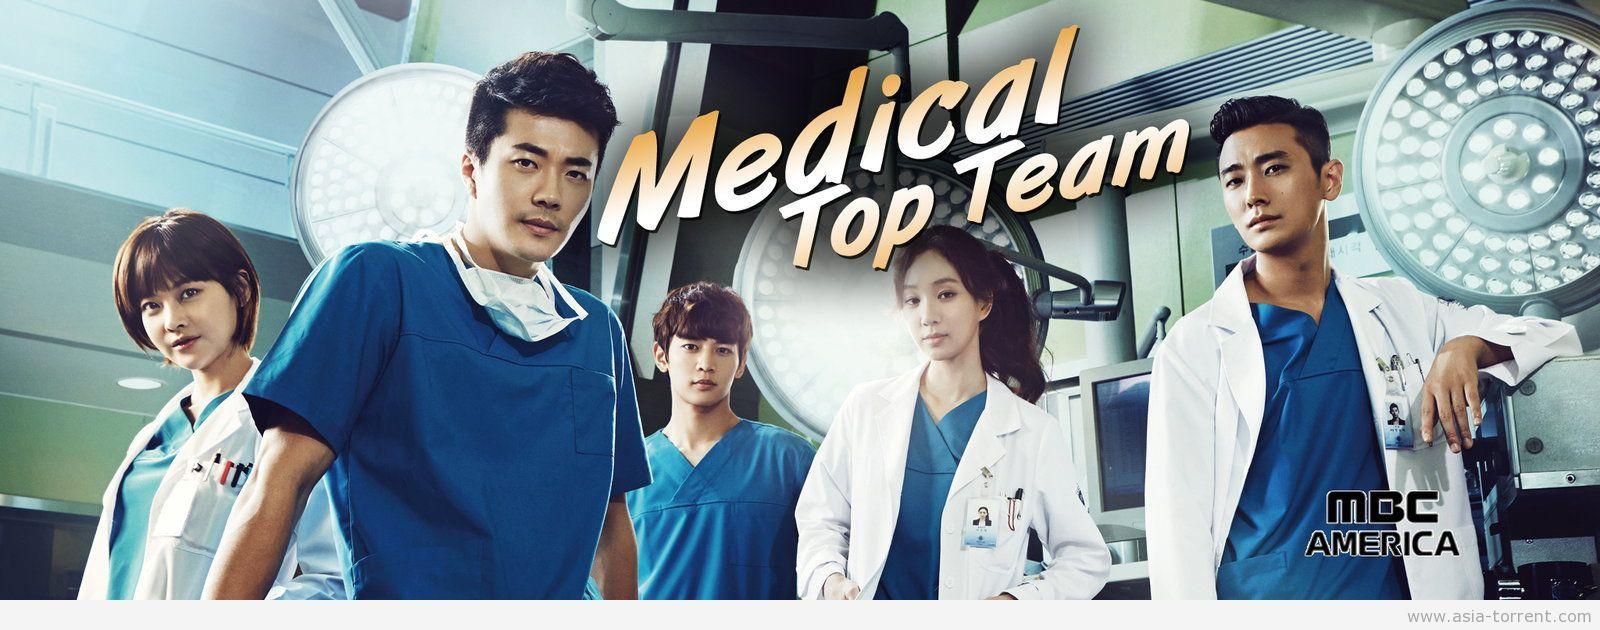 MEDICAL TOP TEAM | 26  DRAMA ASIA | Korean drama, Drama, Asia